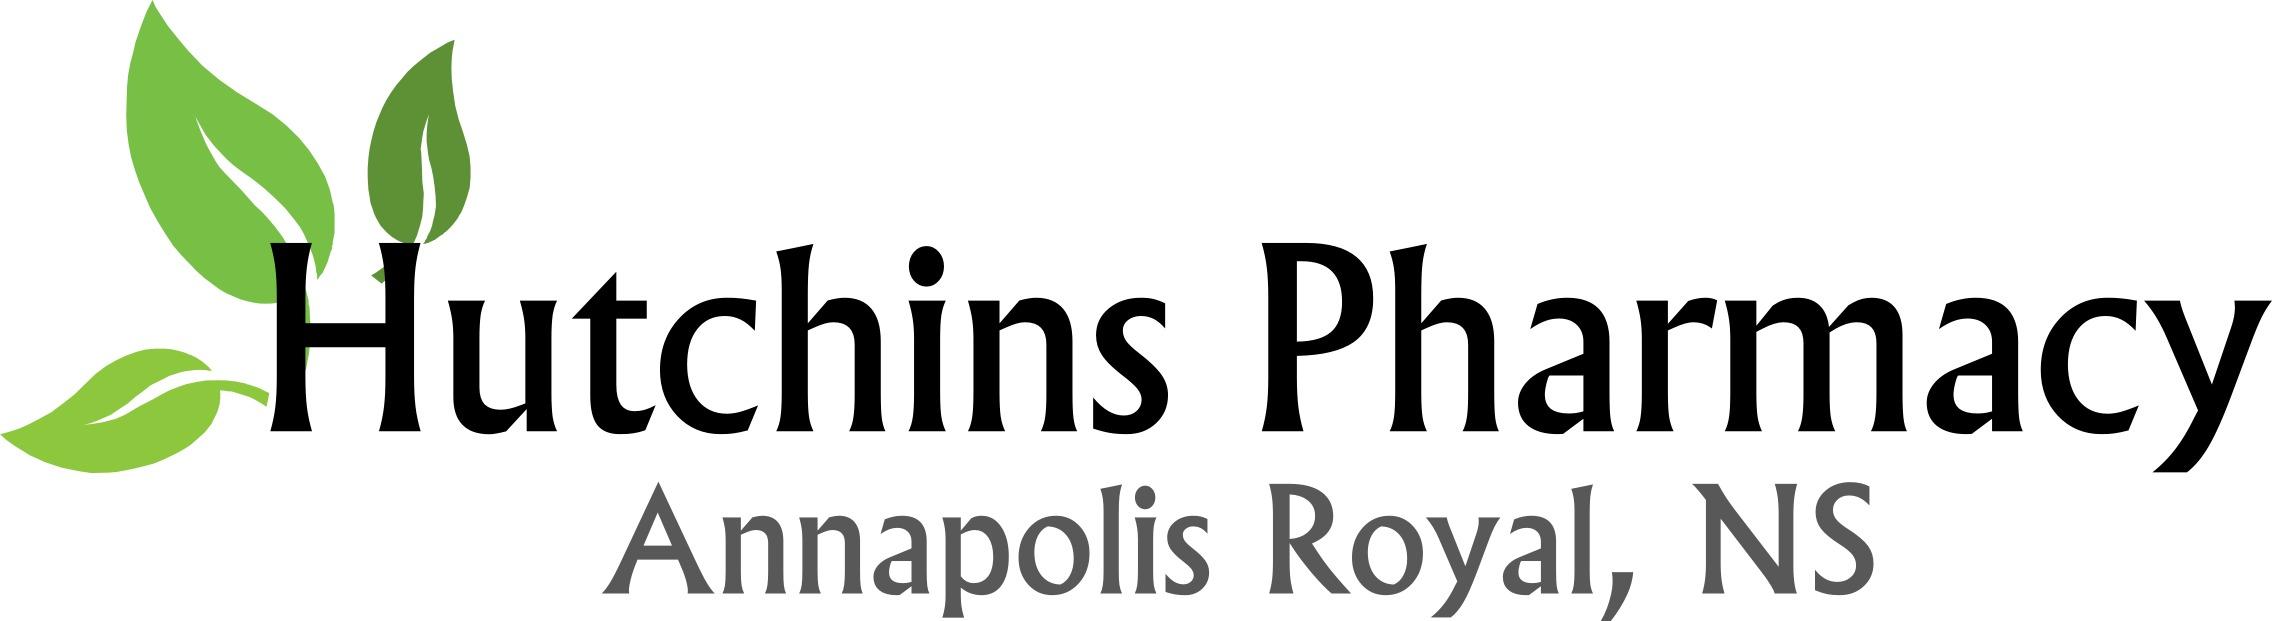 Hutchins Pharmacy